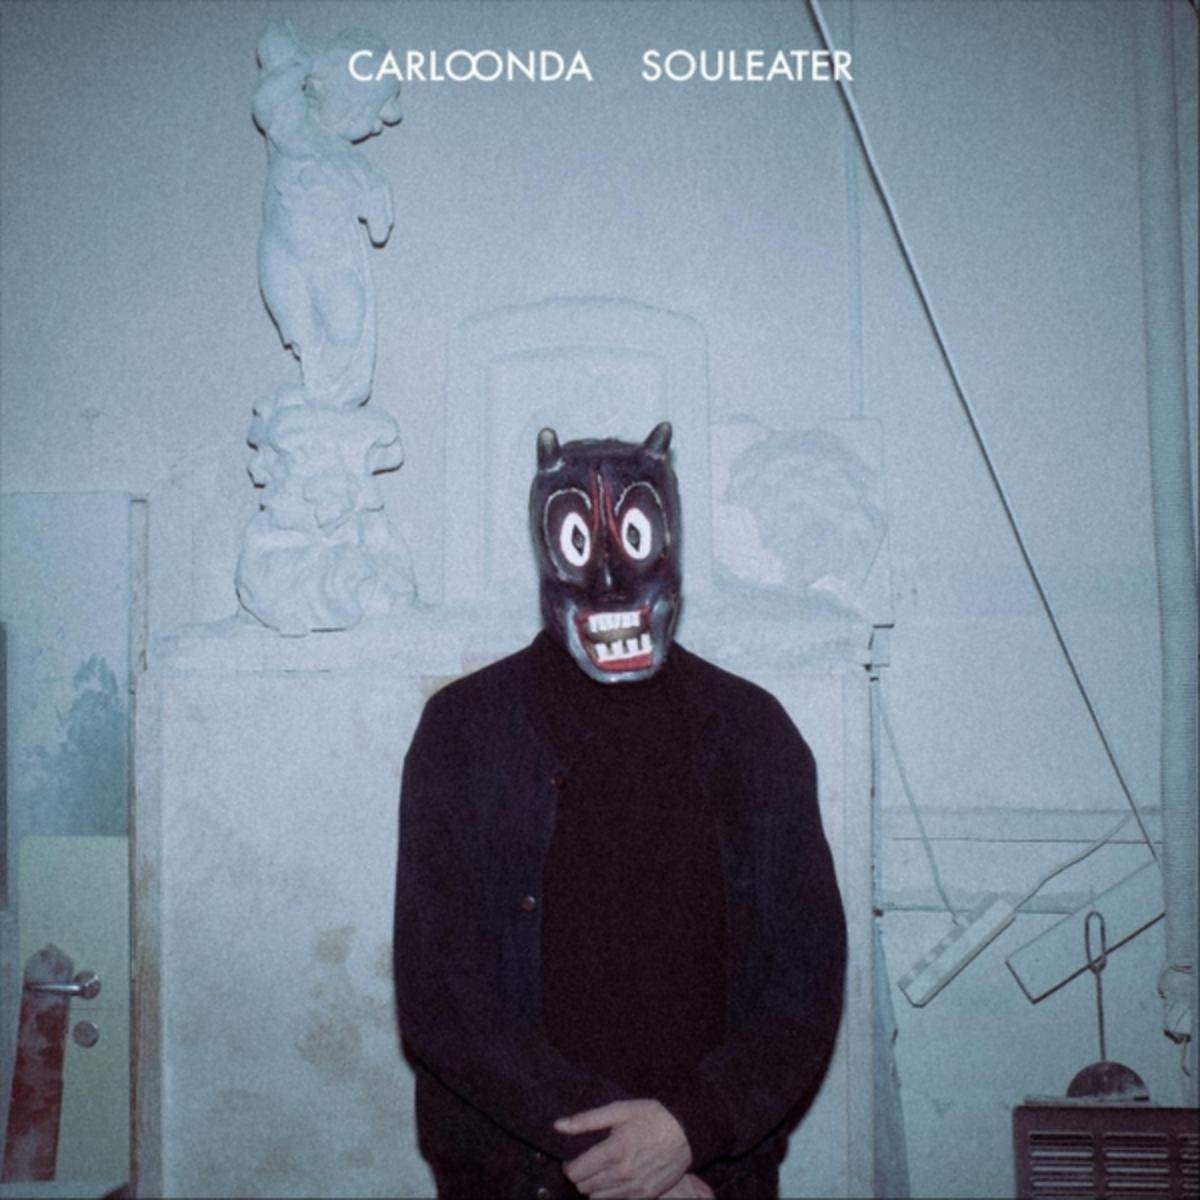 Carlo Onda - Souleater (2021) [FLAC] Download